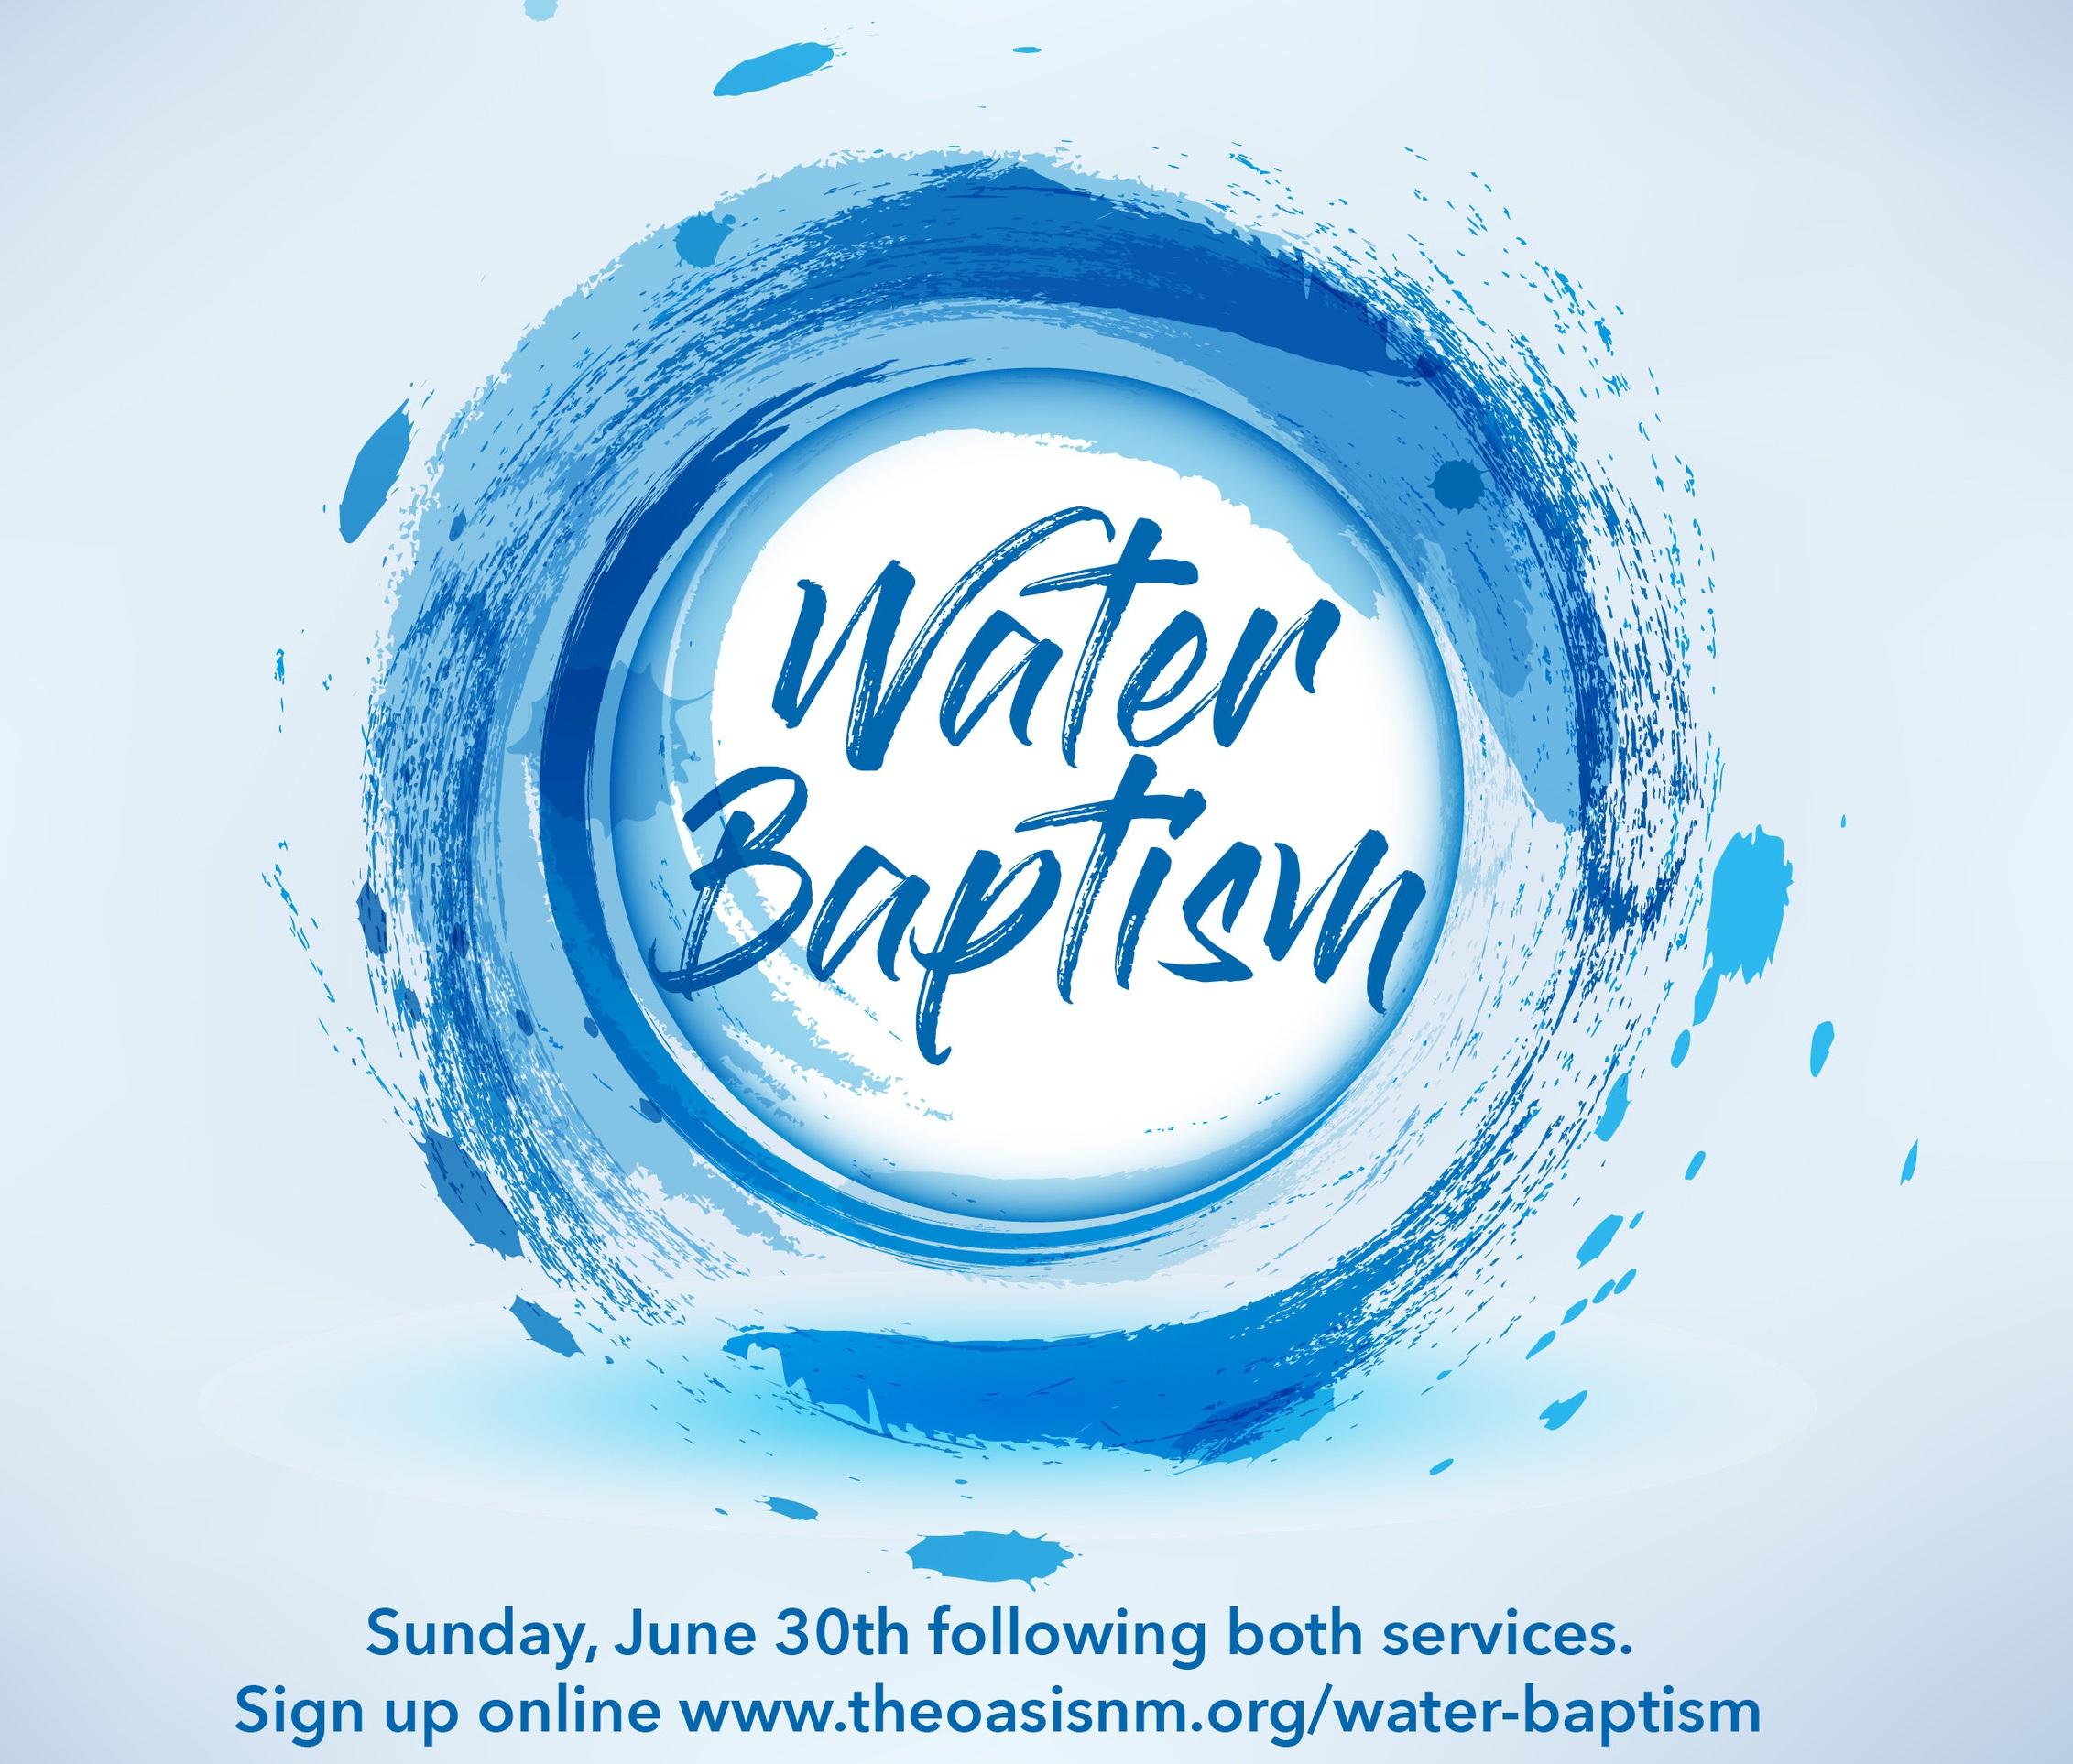 web_water_baptism.jpg